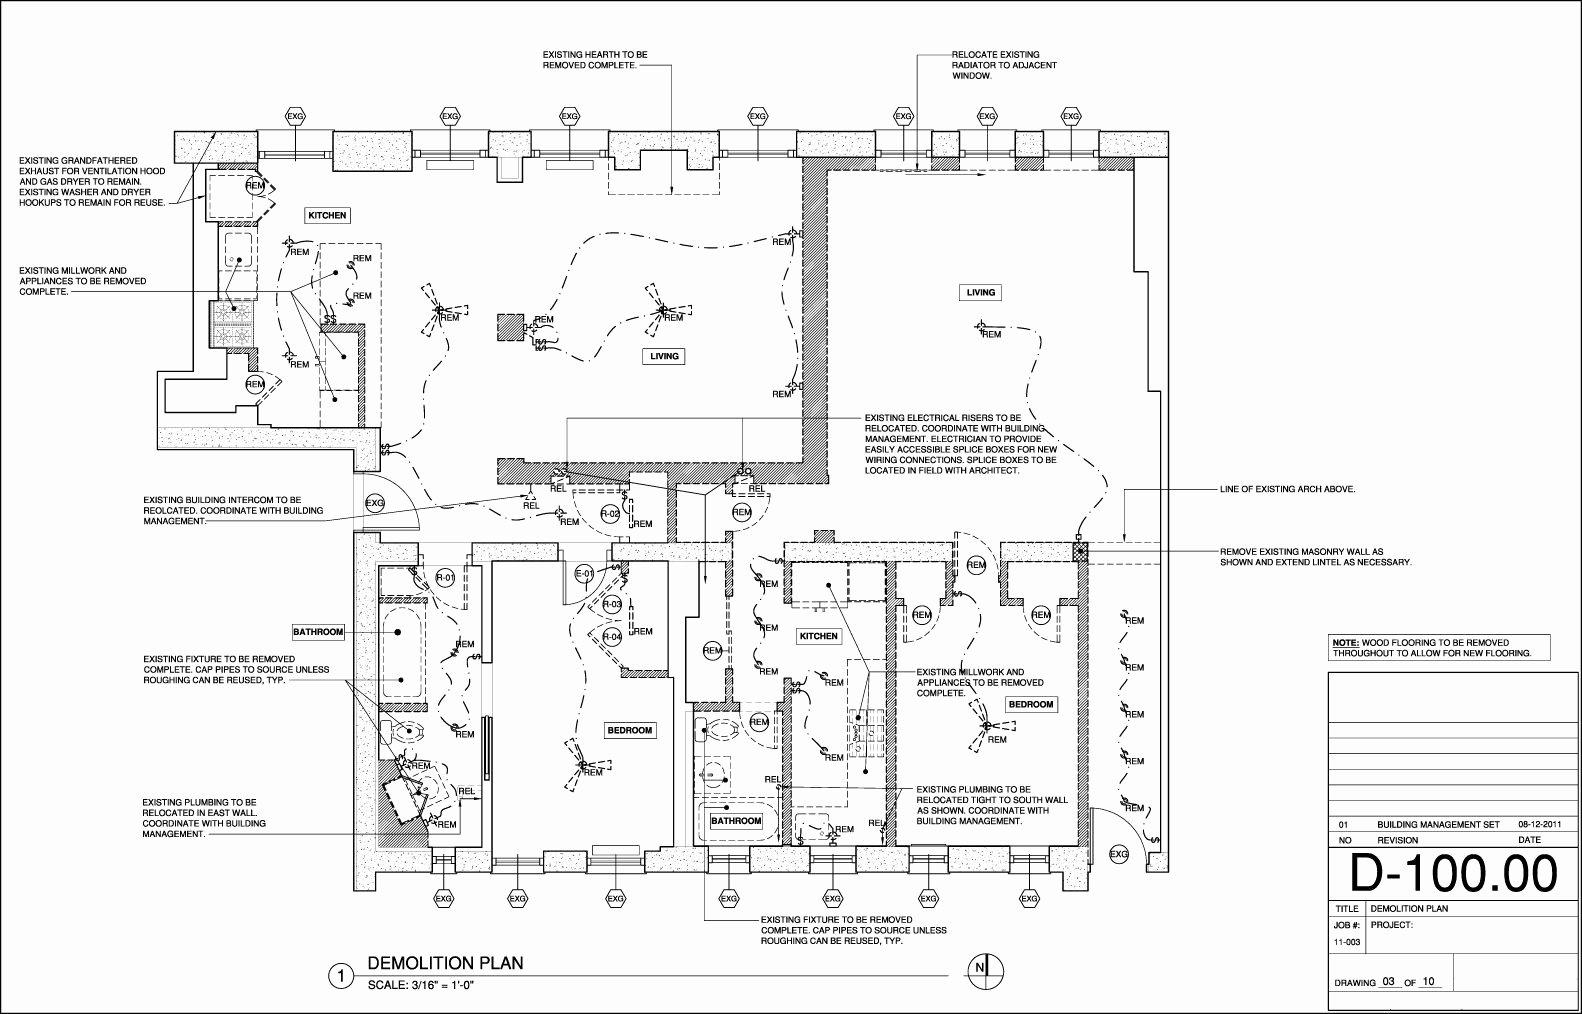 Demo Lesson Plan Template Elegant Demolition Plan Construction Documents